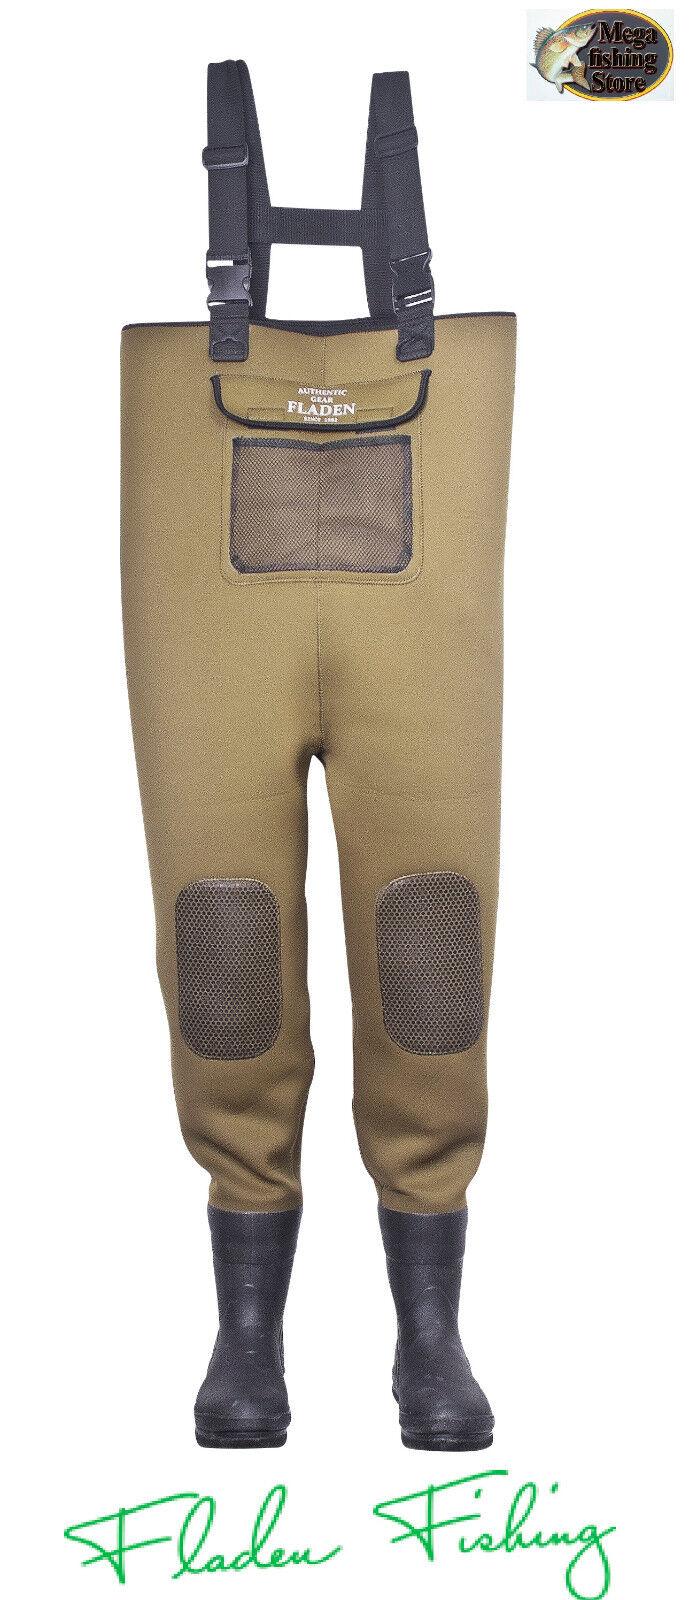 FLADEN Fishing AUTHENTIC GEAR Neoprene Impermeabili Pantaloni Pantaloni Pantaloni 4mm con suola feltro dimensioni ver 443336